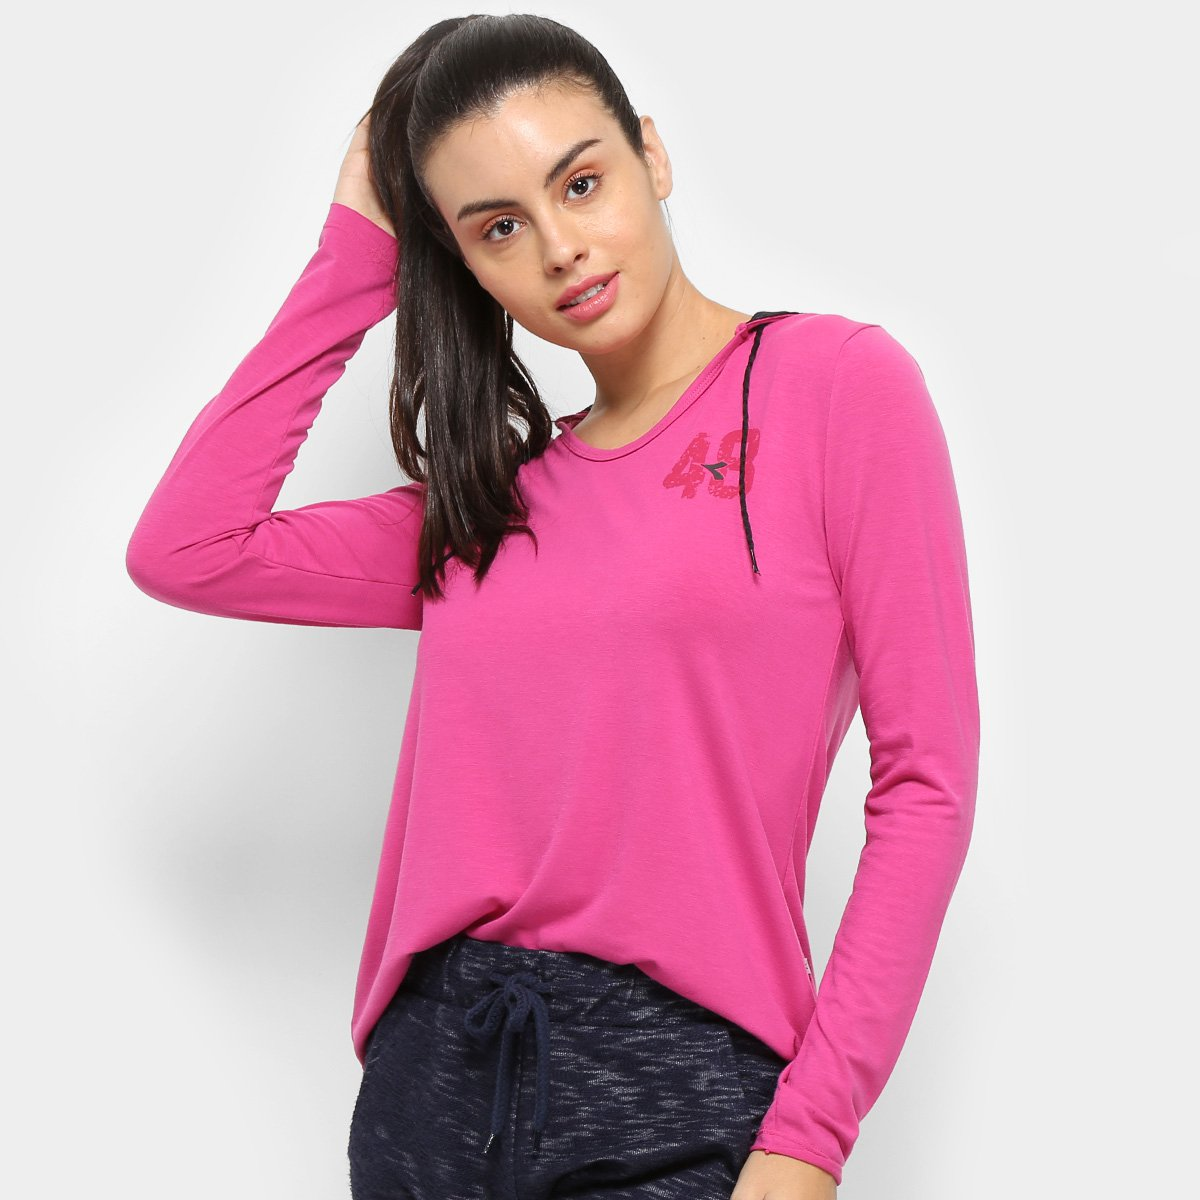 L Diadora Pink Flow Flow 261172 Camiseta Camiseta Diadora M x0cw1wOPqB